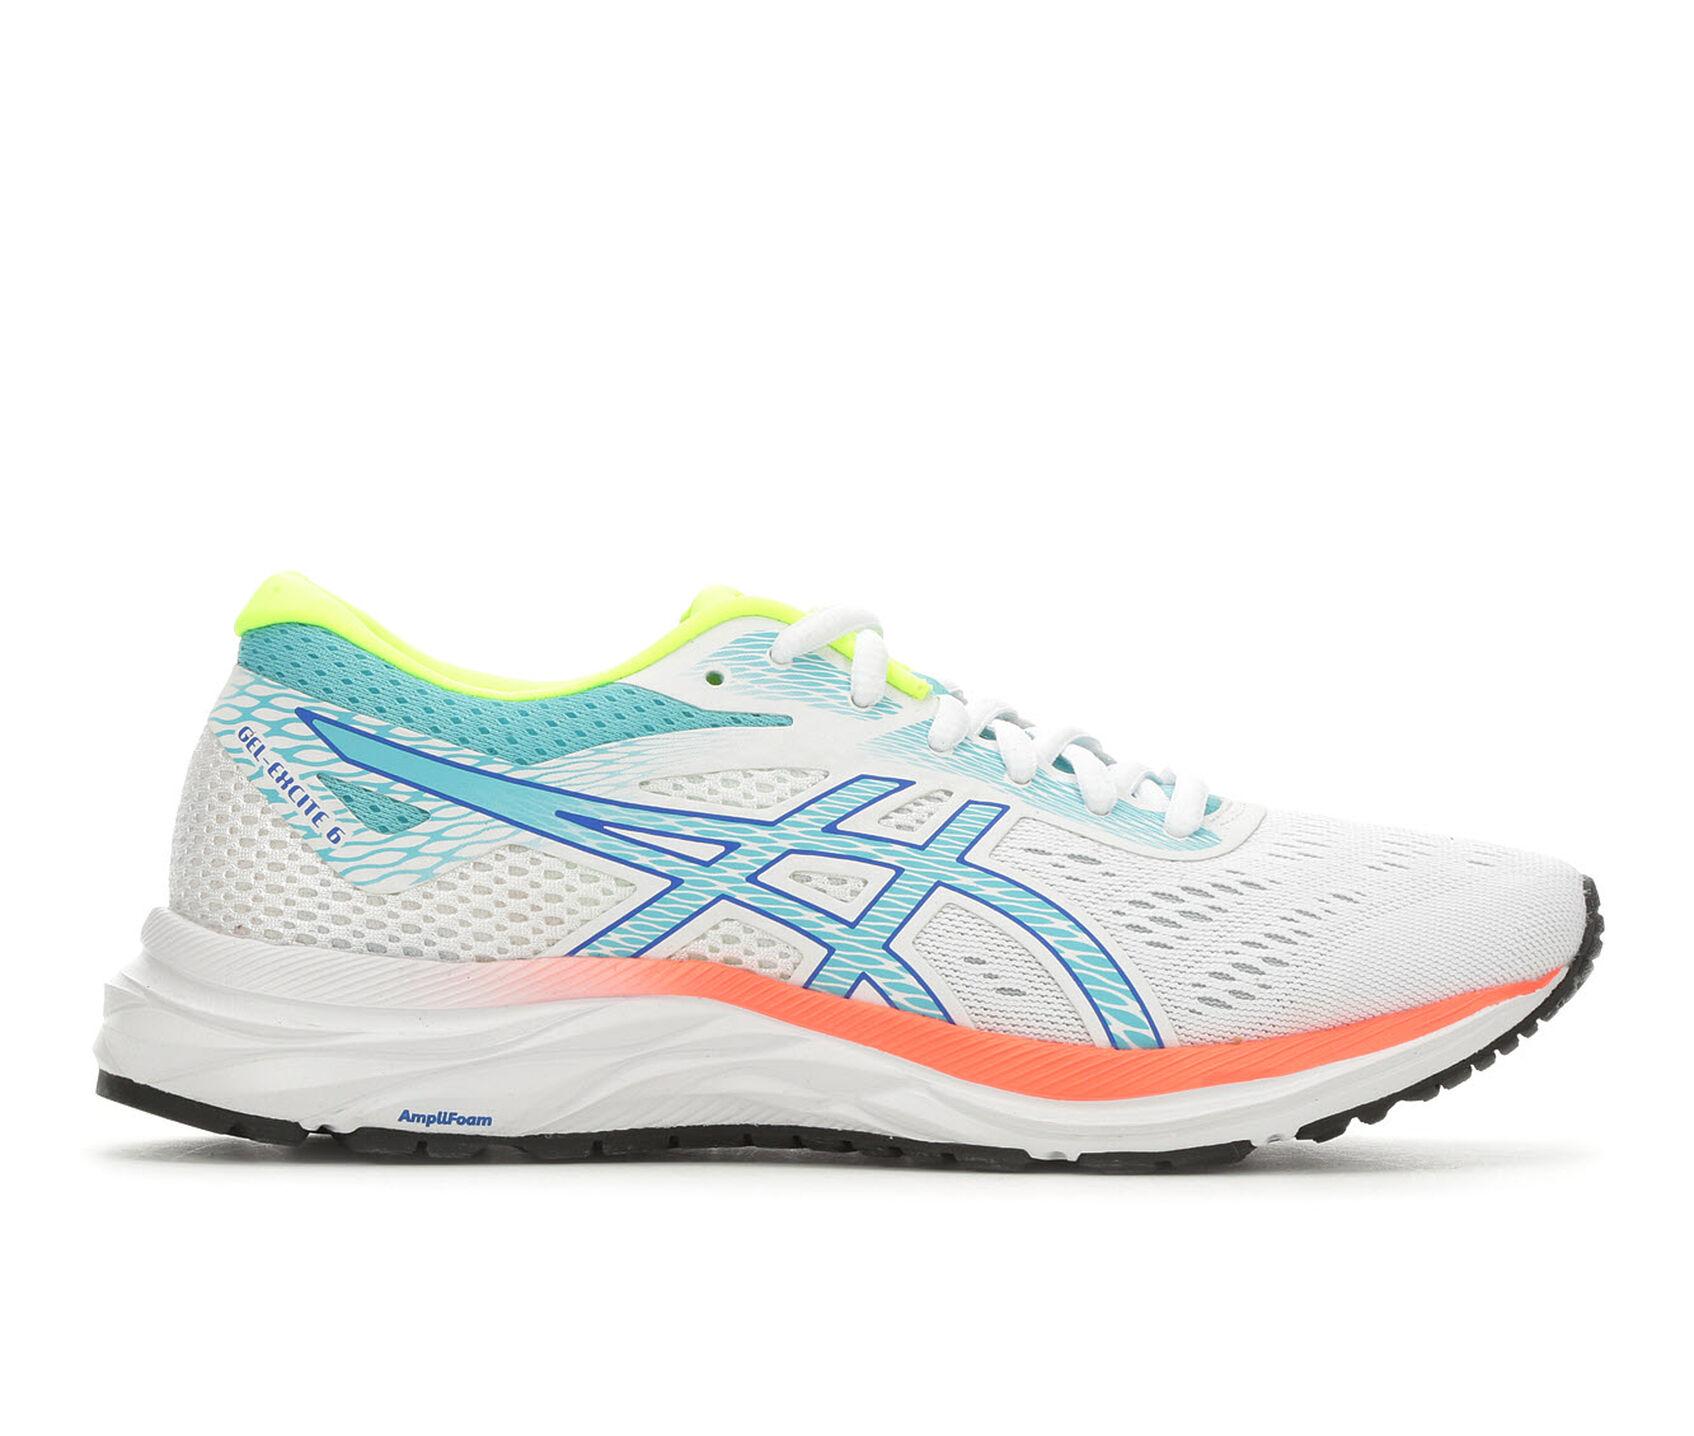 best service 8951f b736b Women's ASICS Gel Excite 6 SP Running Shoes